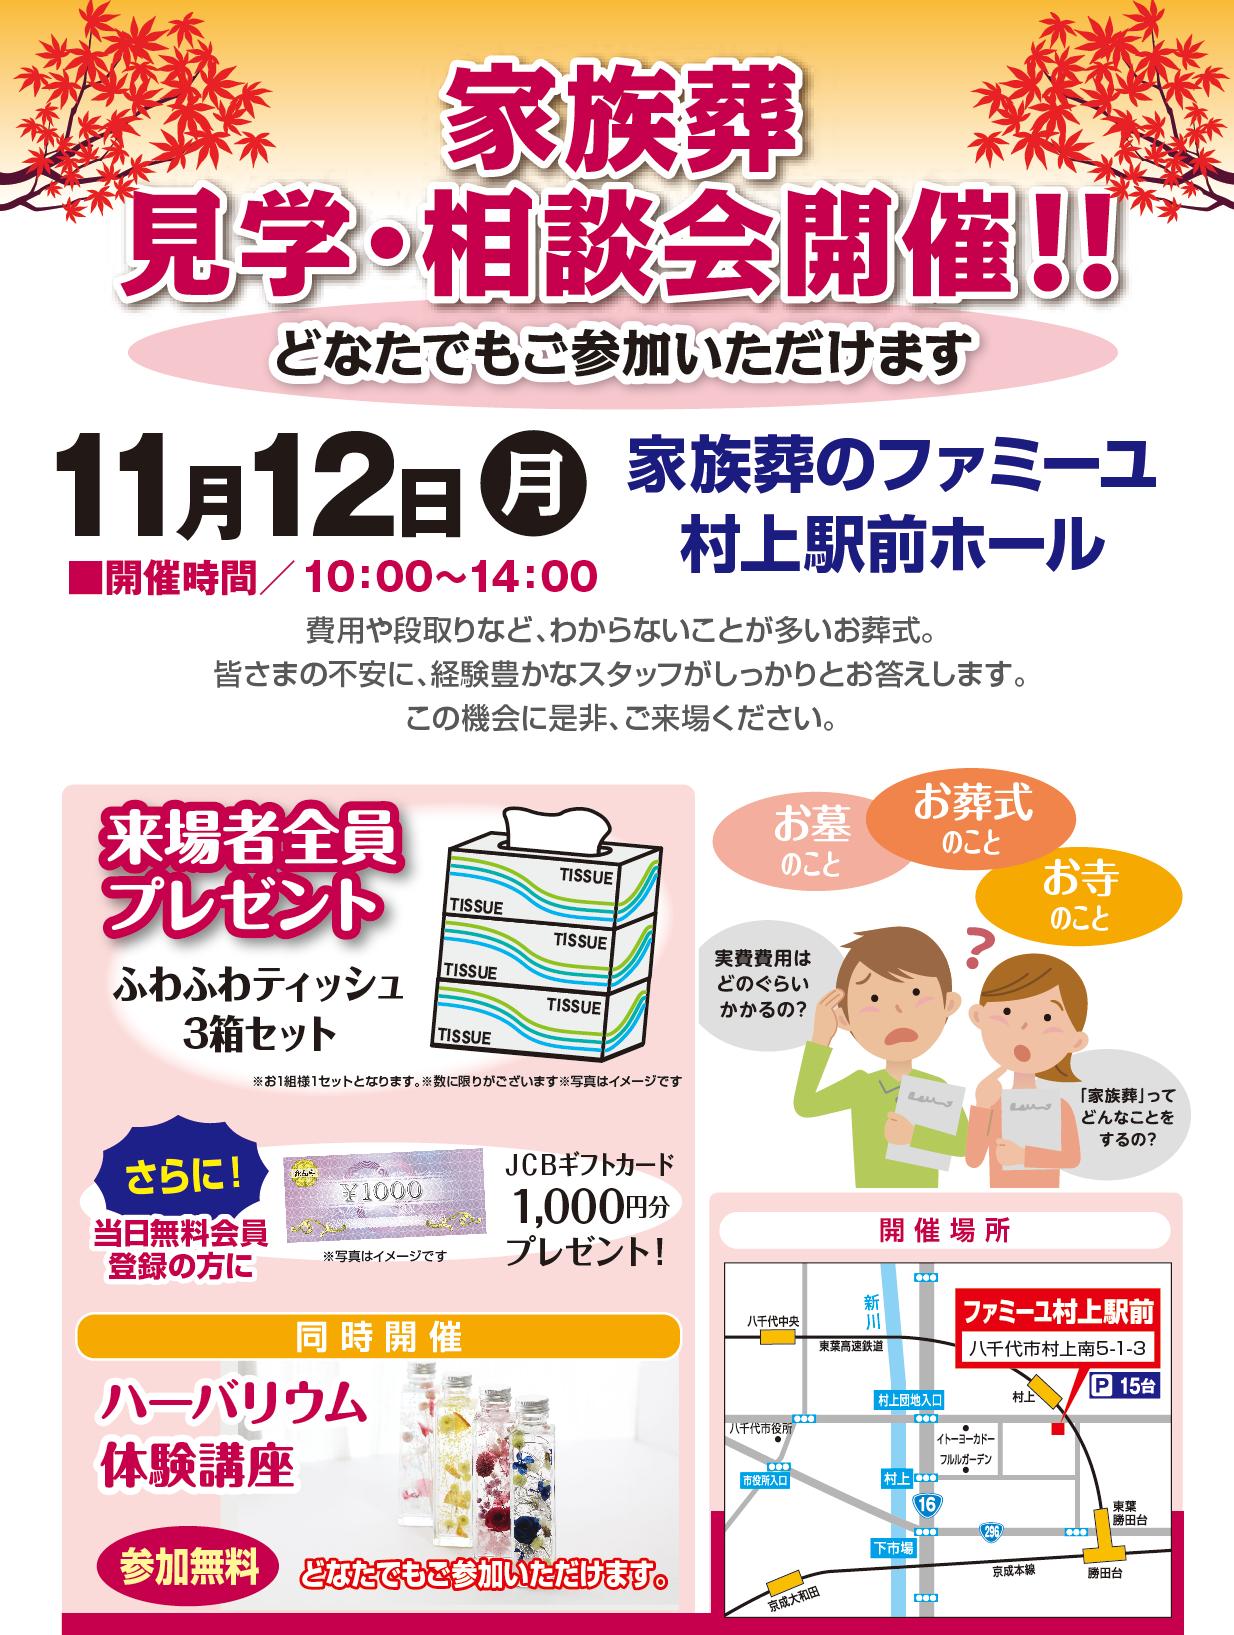 https://www.famille-kazokusou.com/search_area/20181112murakamichibakengaku.png